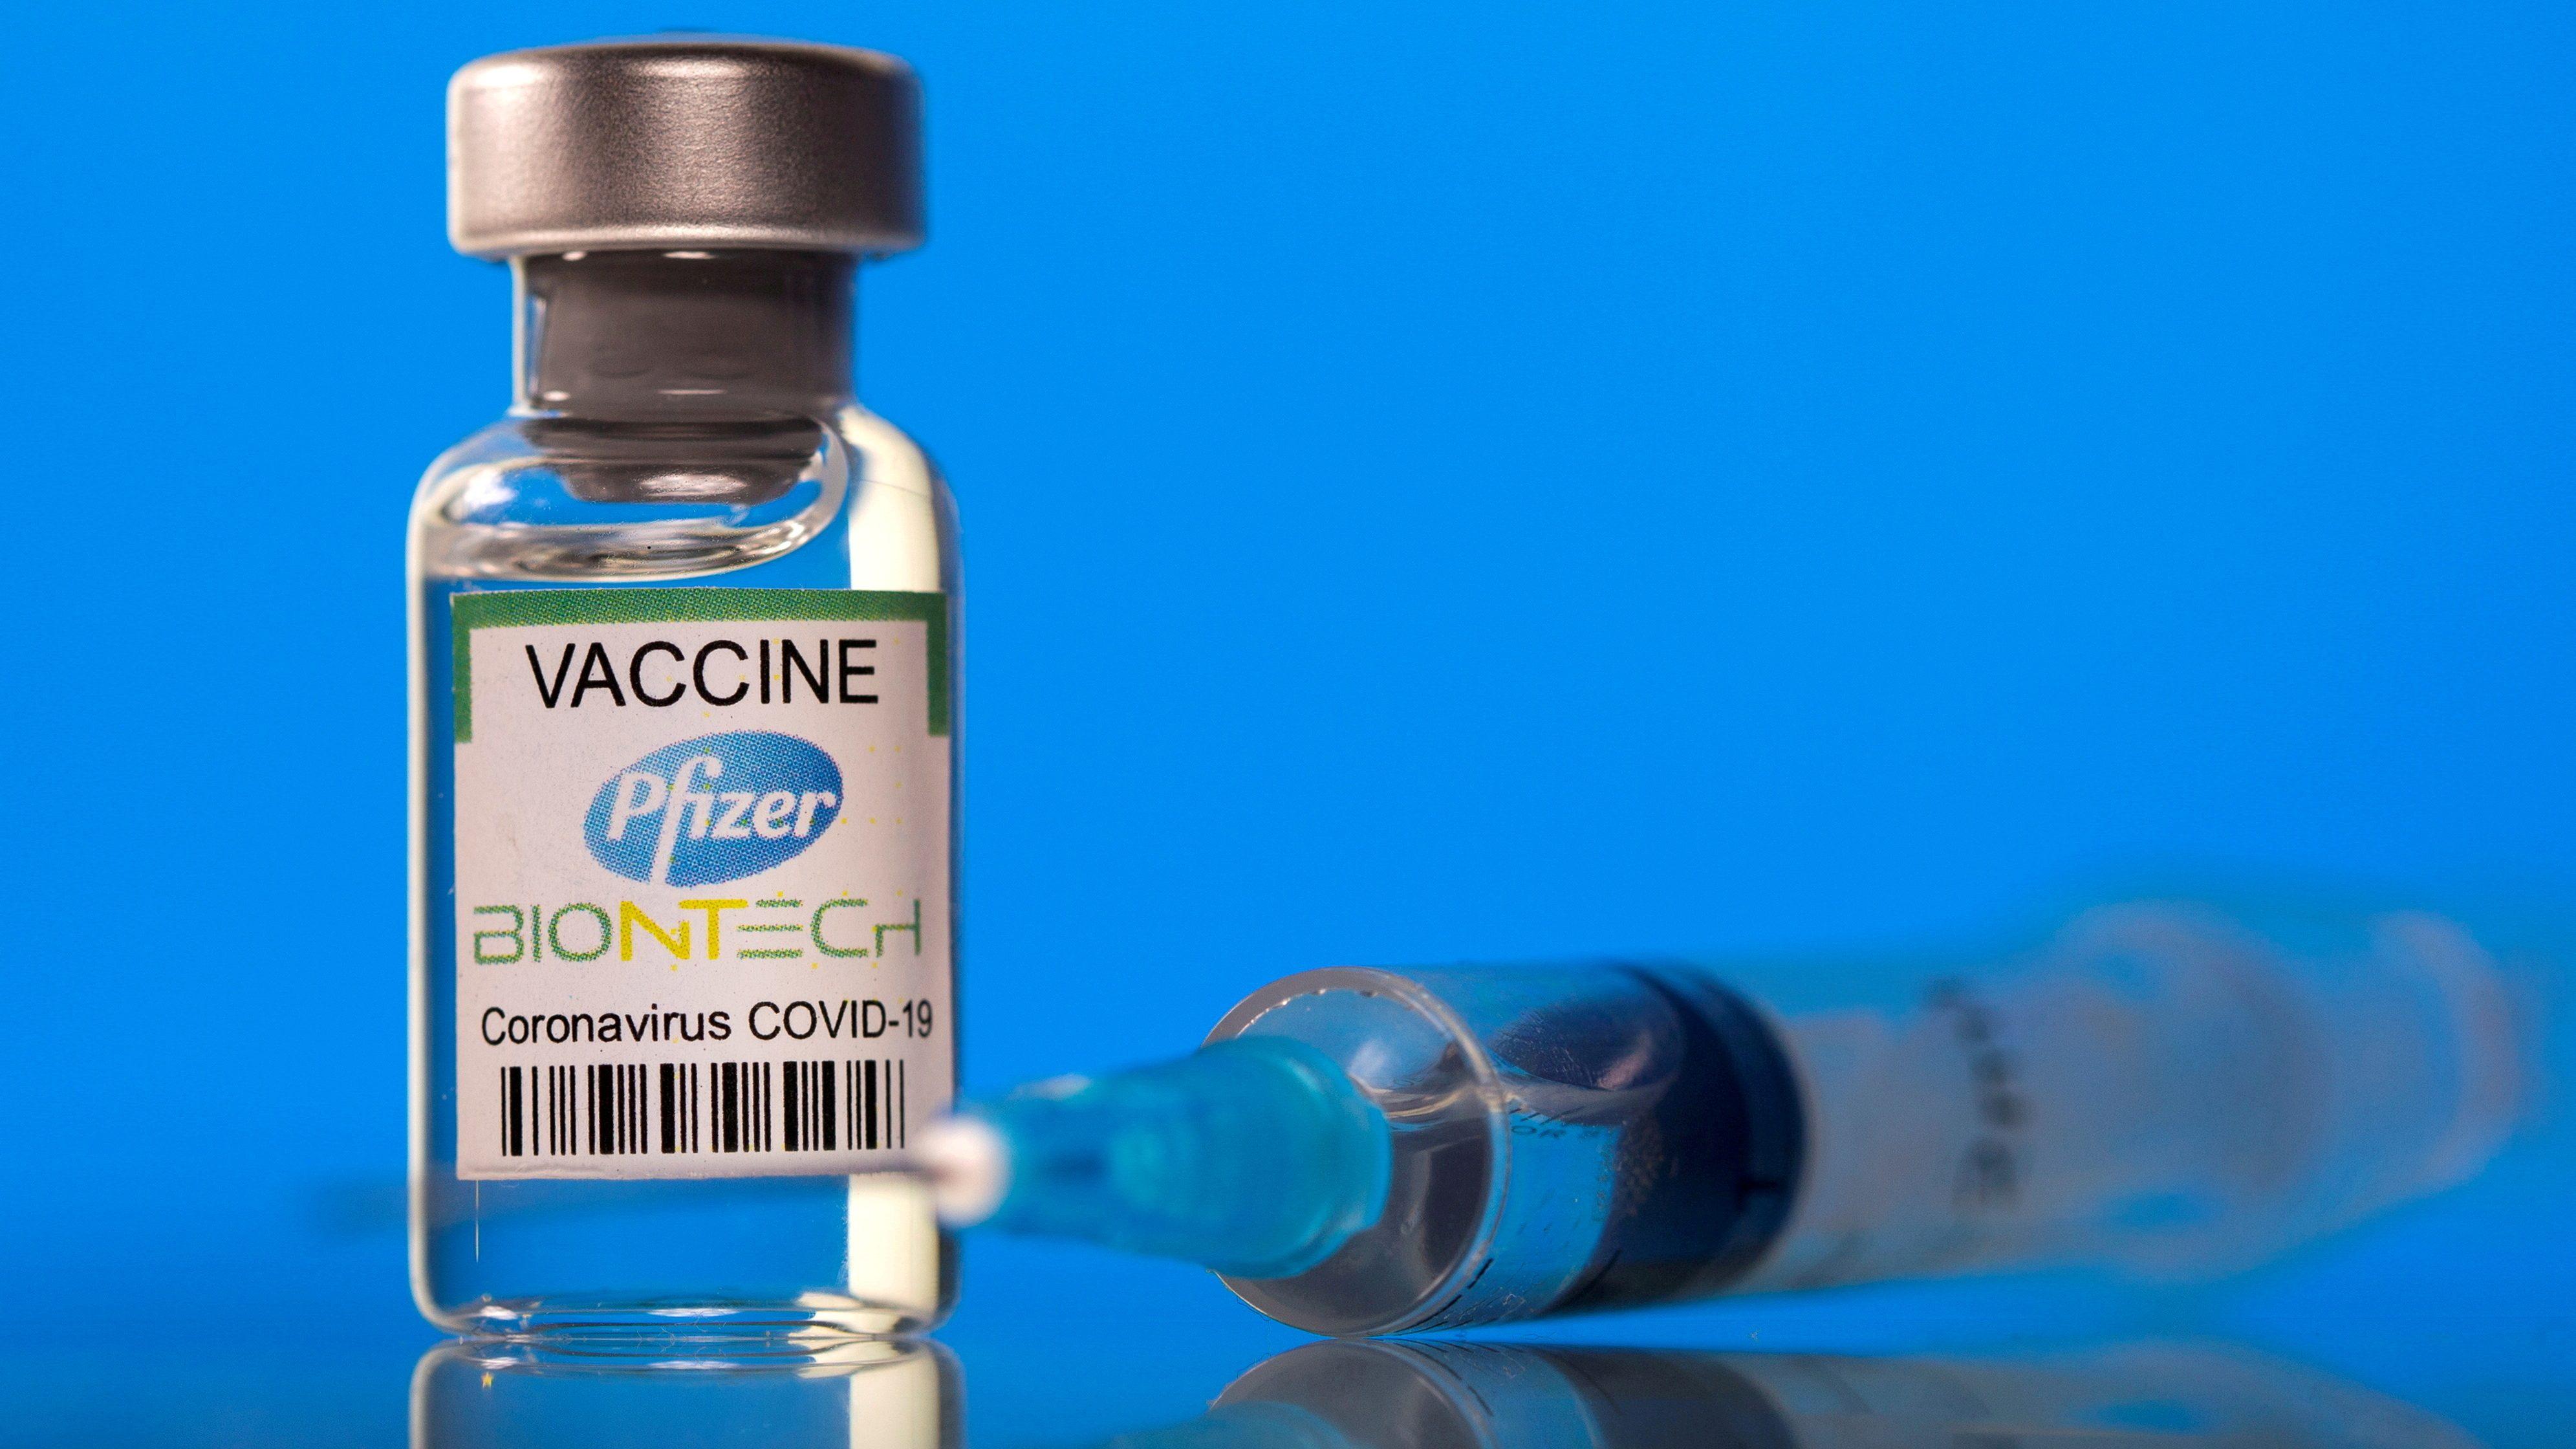 A vial of Comirnaty, the Pfizer-BioNTech Covid-19 vaccine